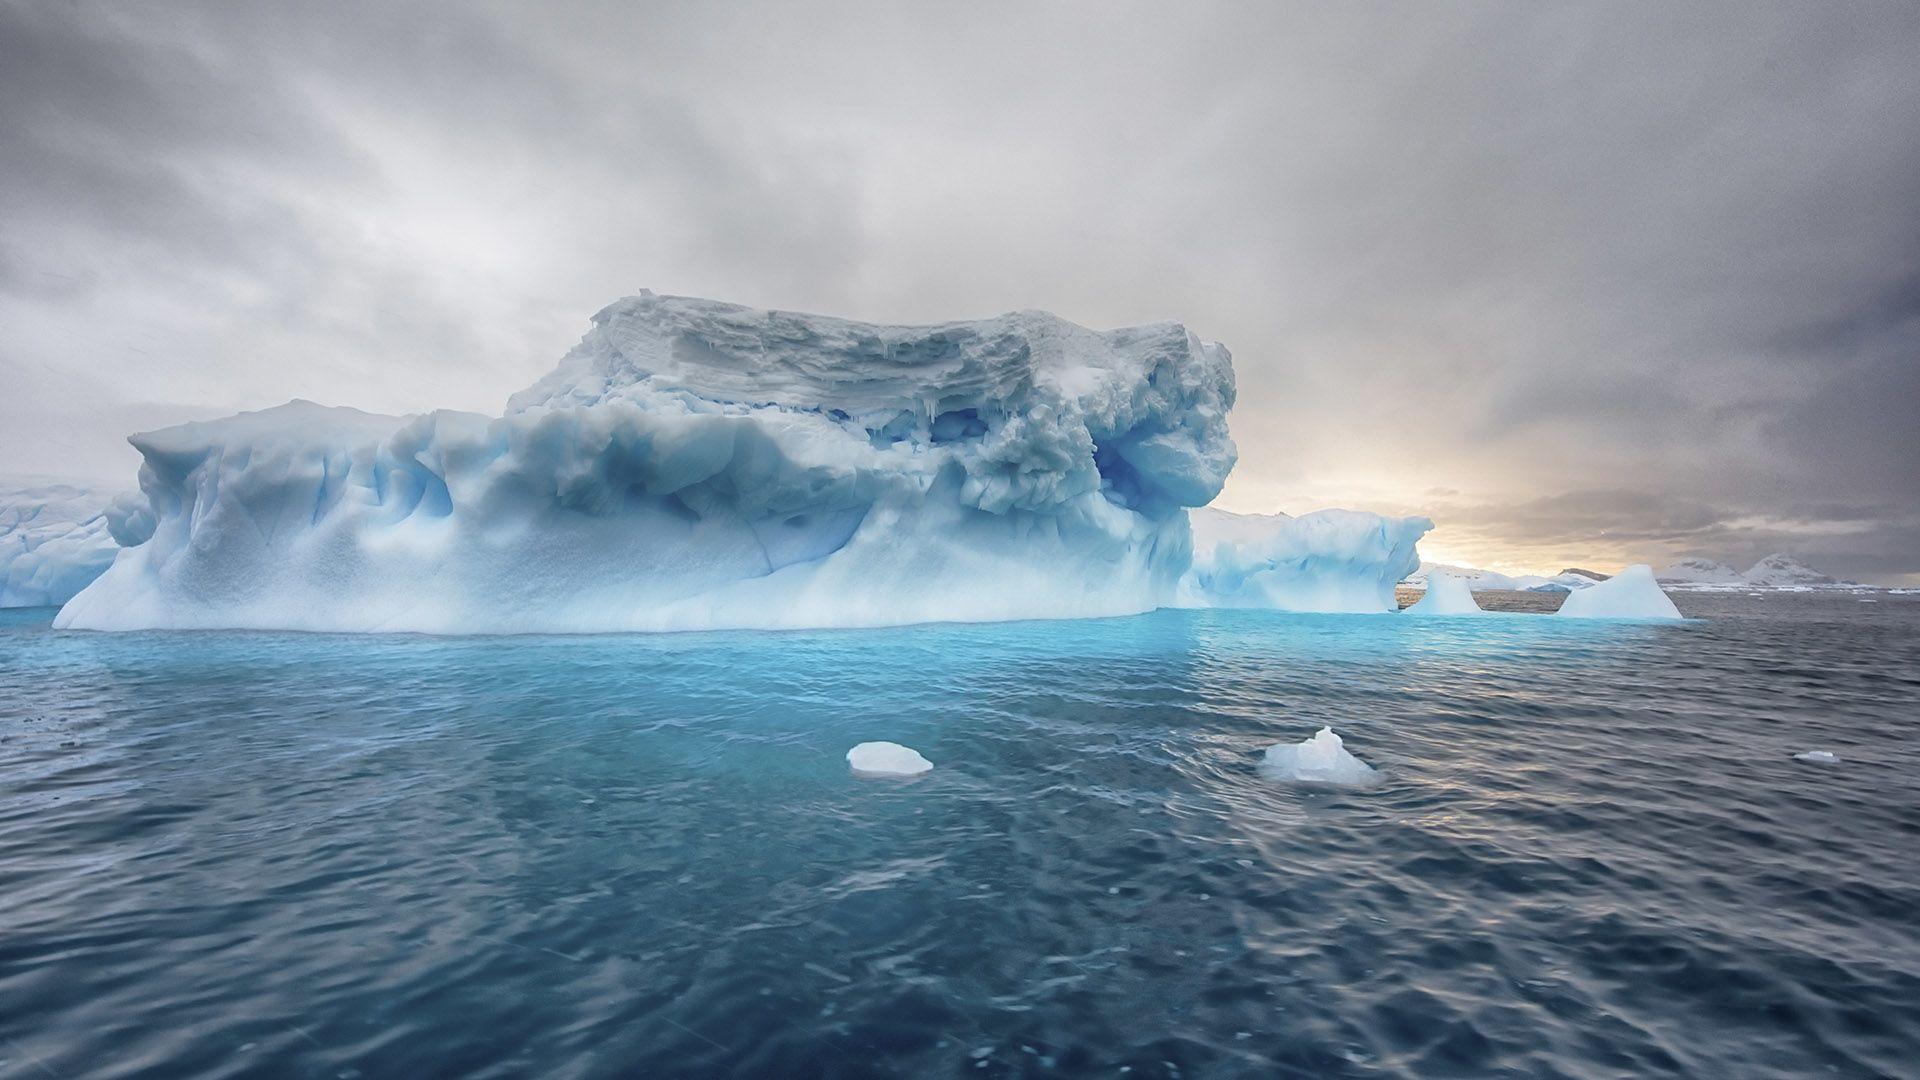 Jéghegy a Déli-óceánon